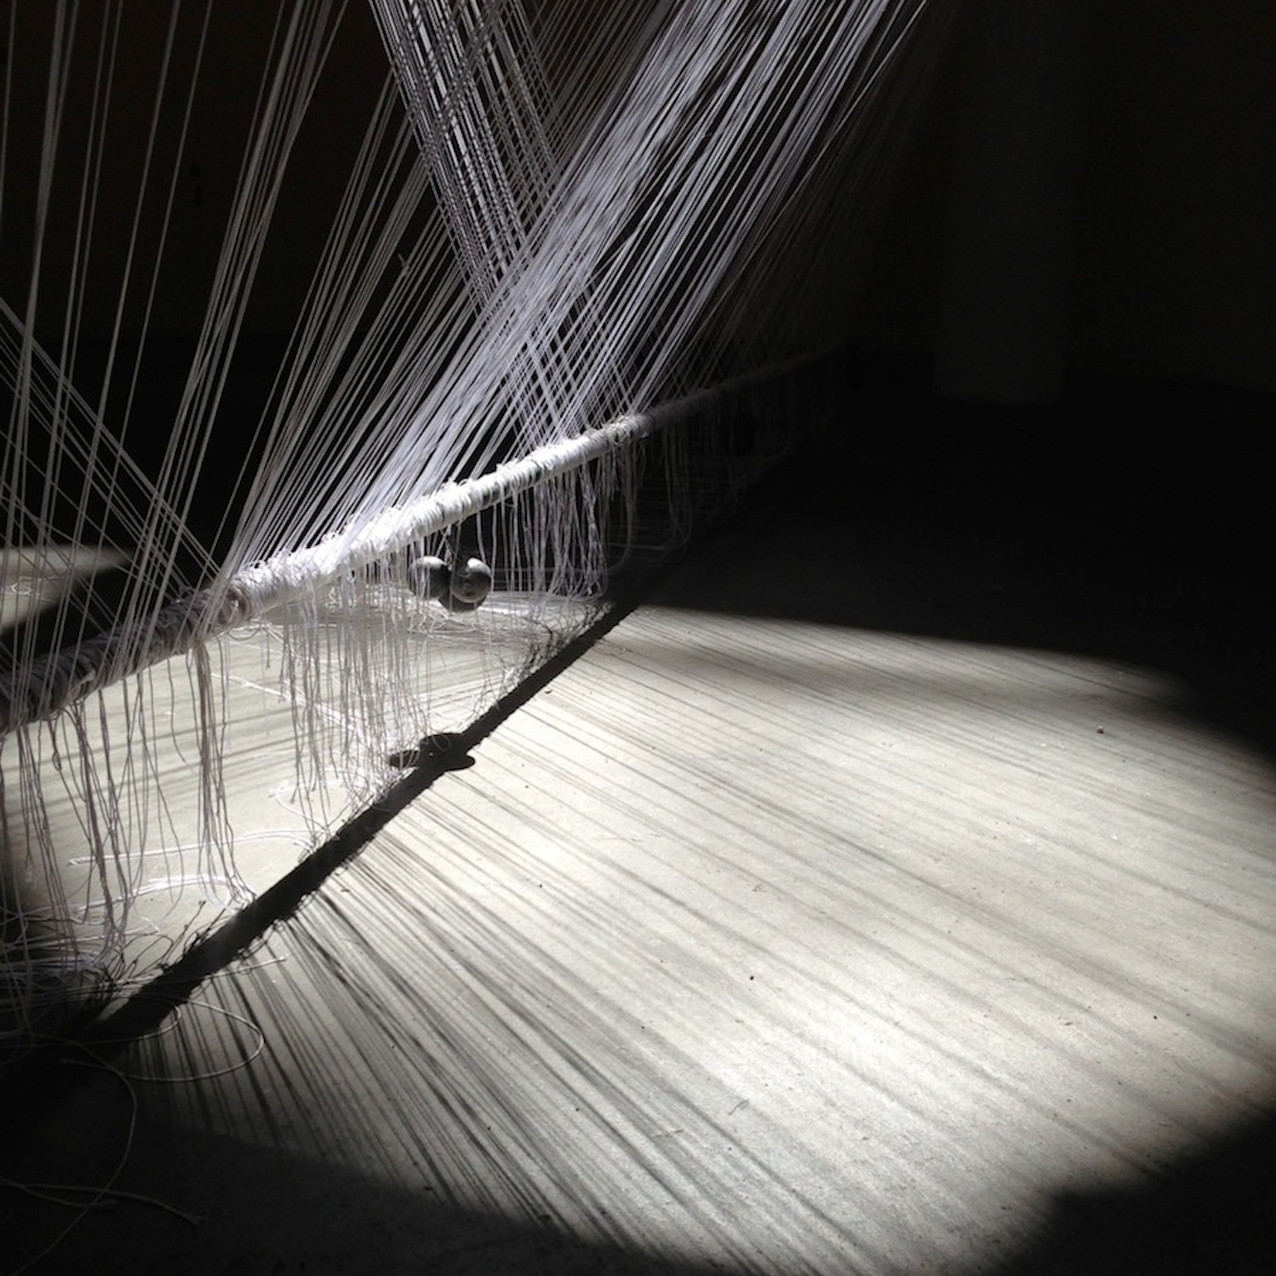 Zygarewicz_L_4e_ 'a thousand threads'